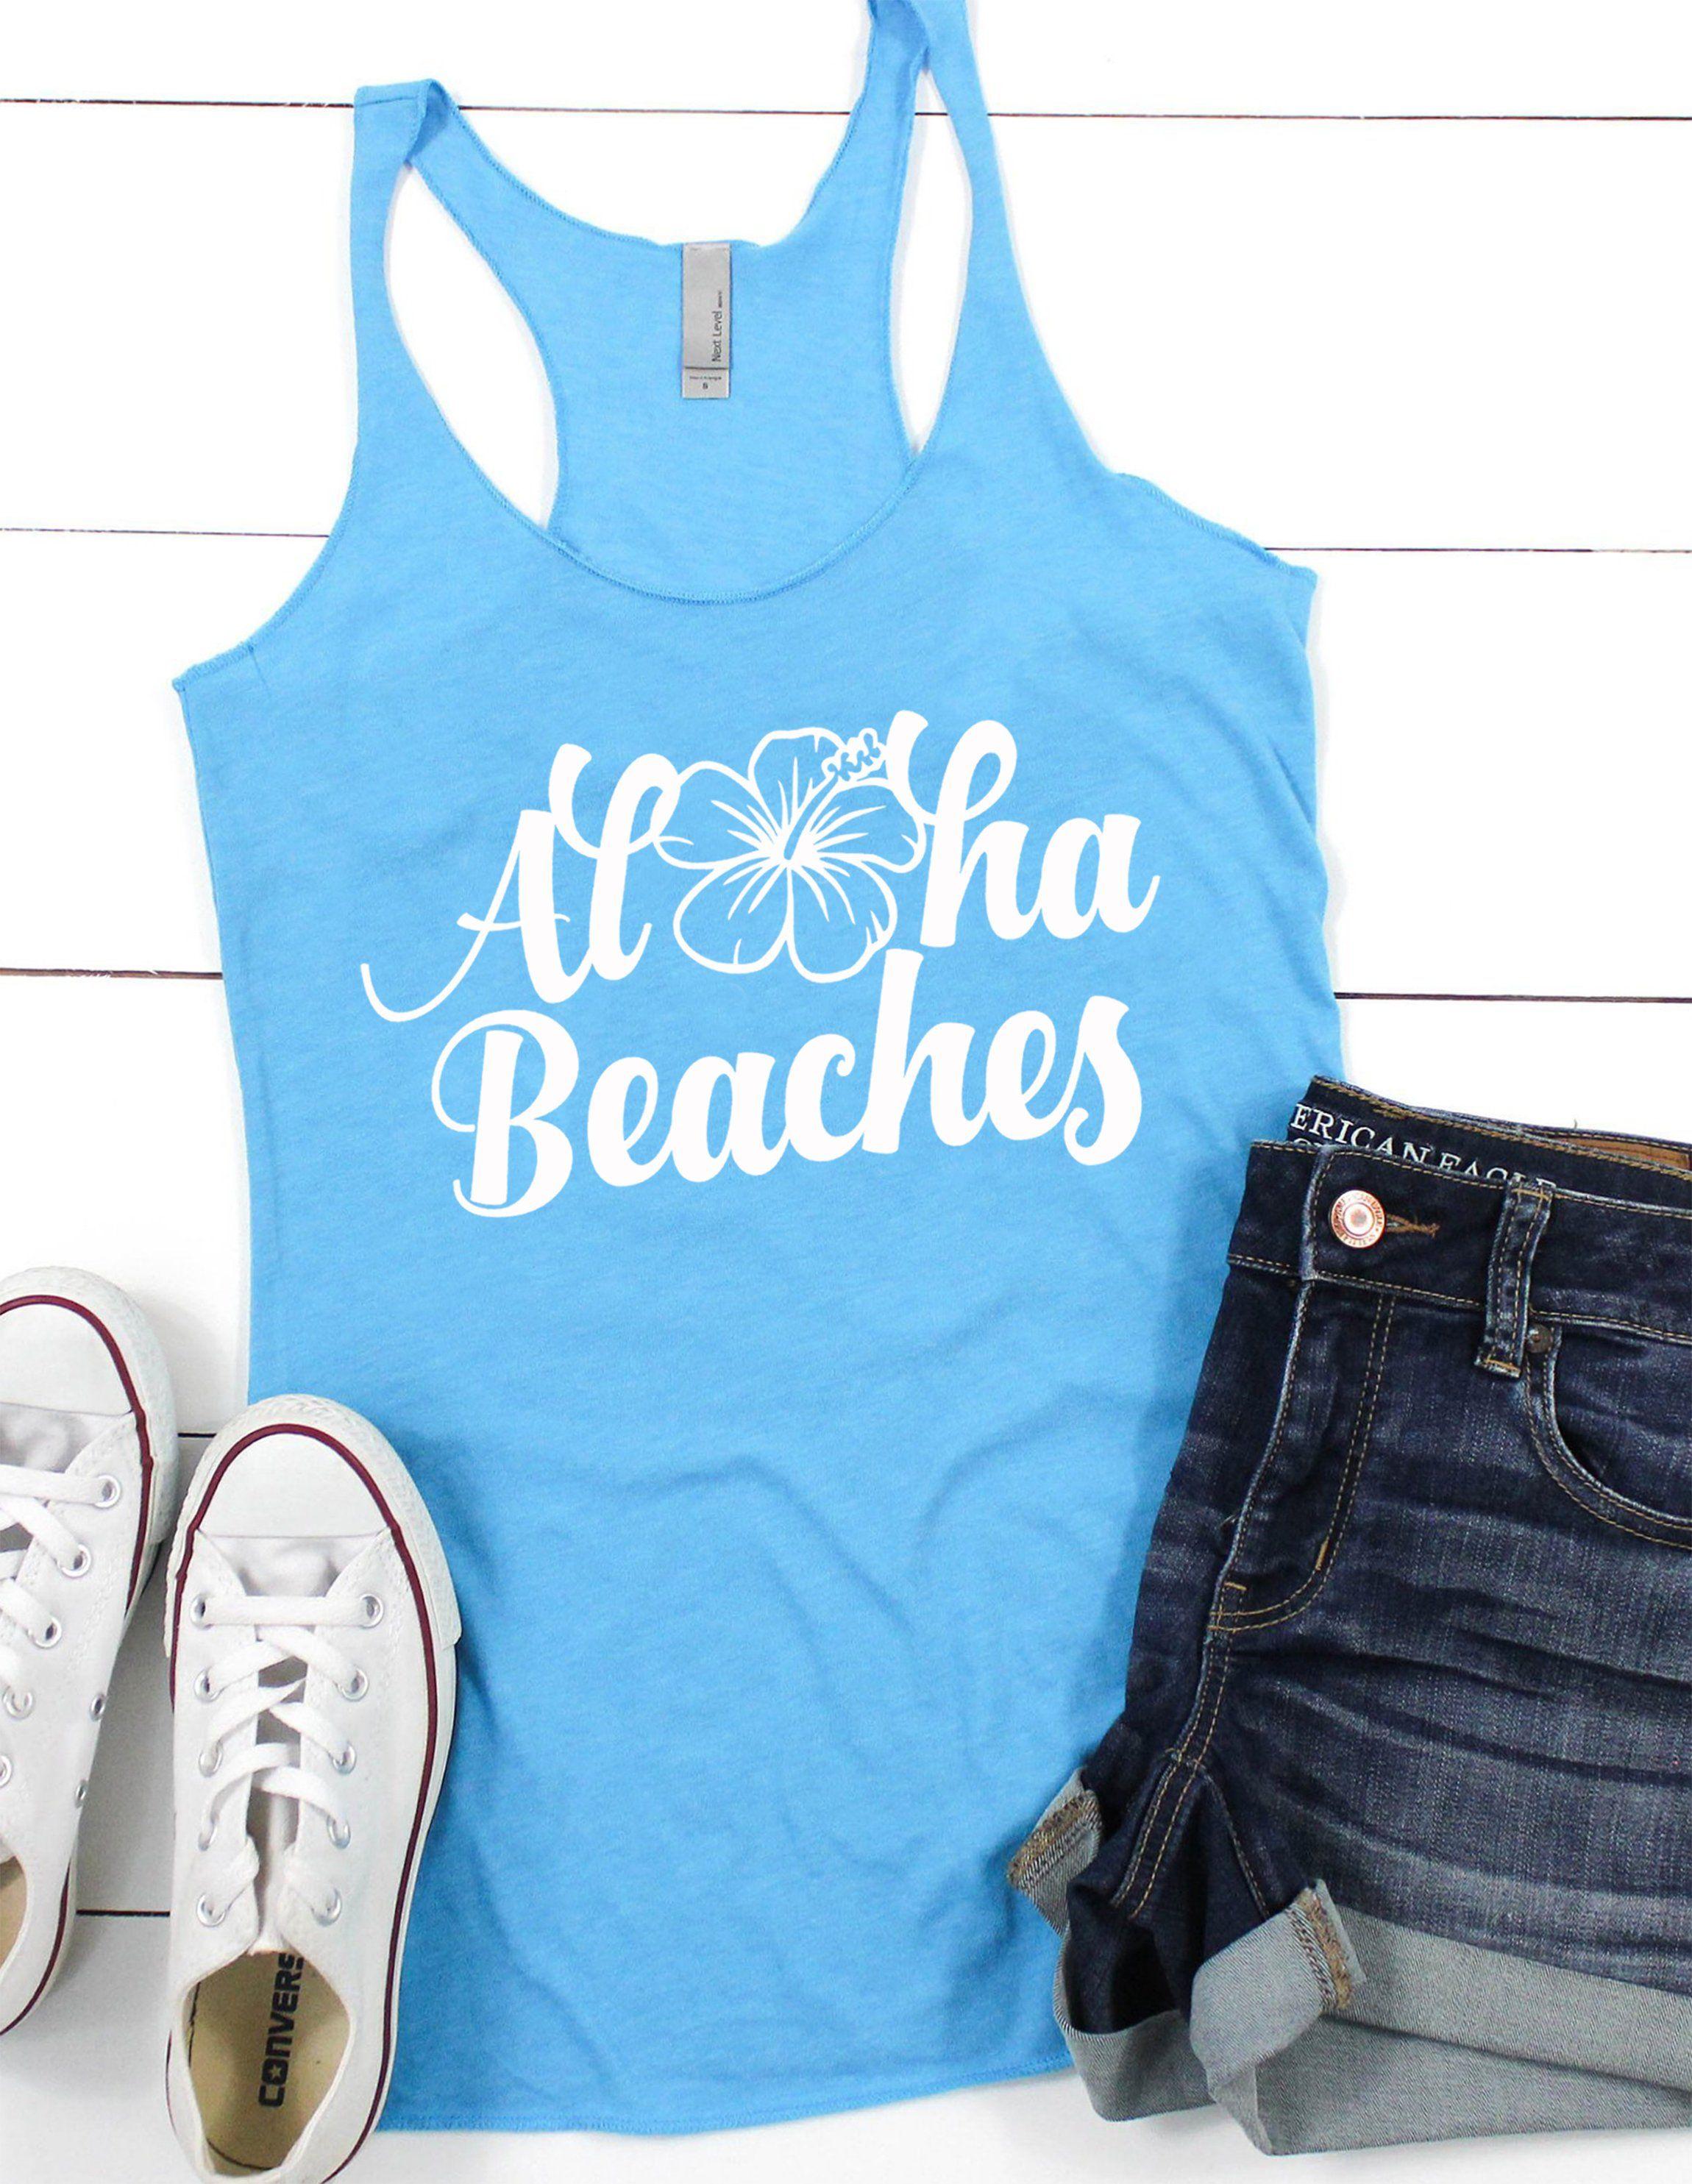 6701fd695f Aloha Beaches Aloha Beaches Tank Top, Summer Beach Trip Tshirt, Vacation  Women Graphic Tee